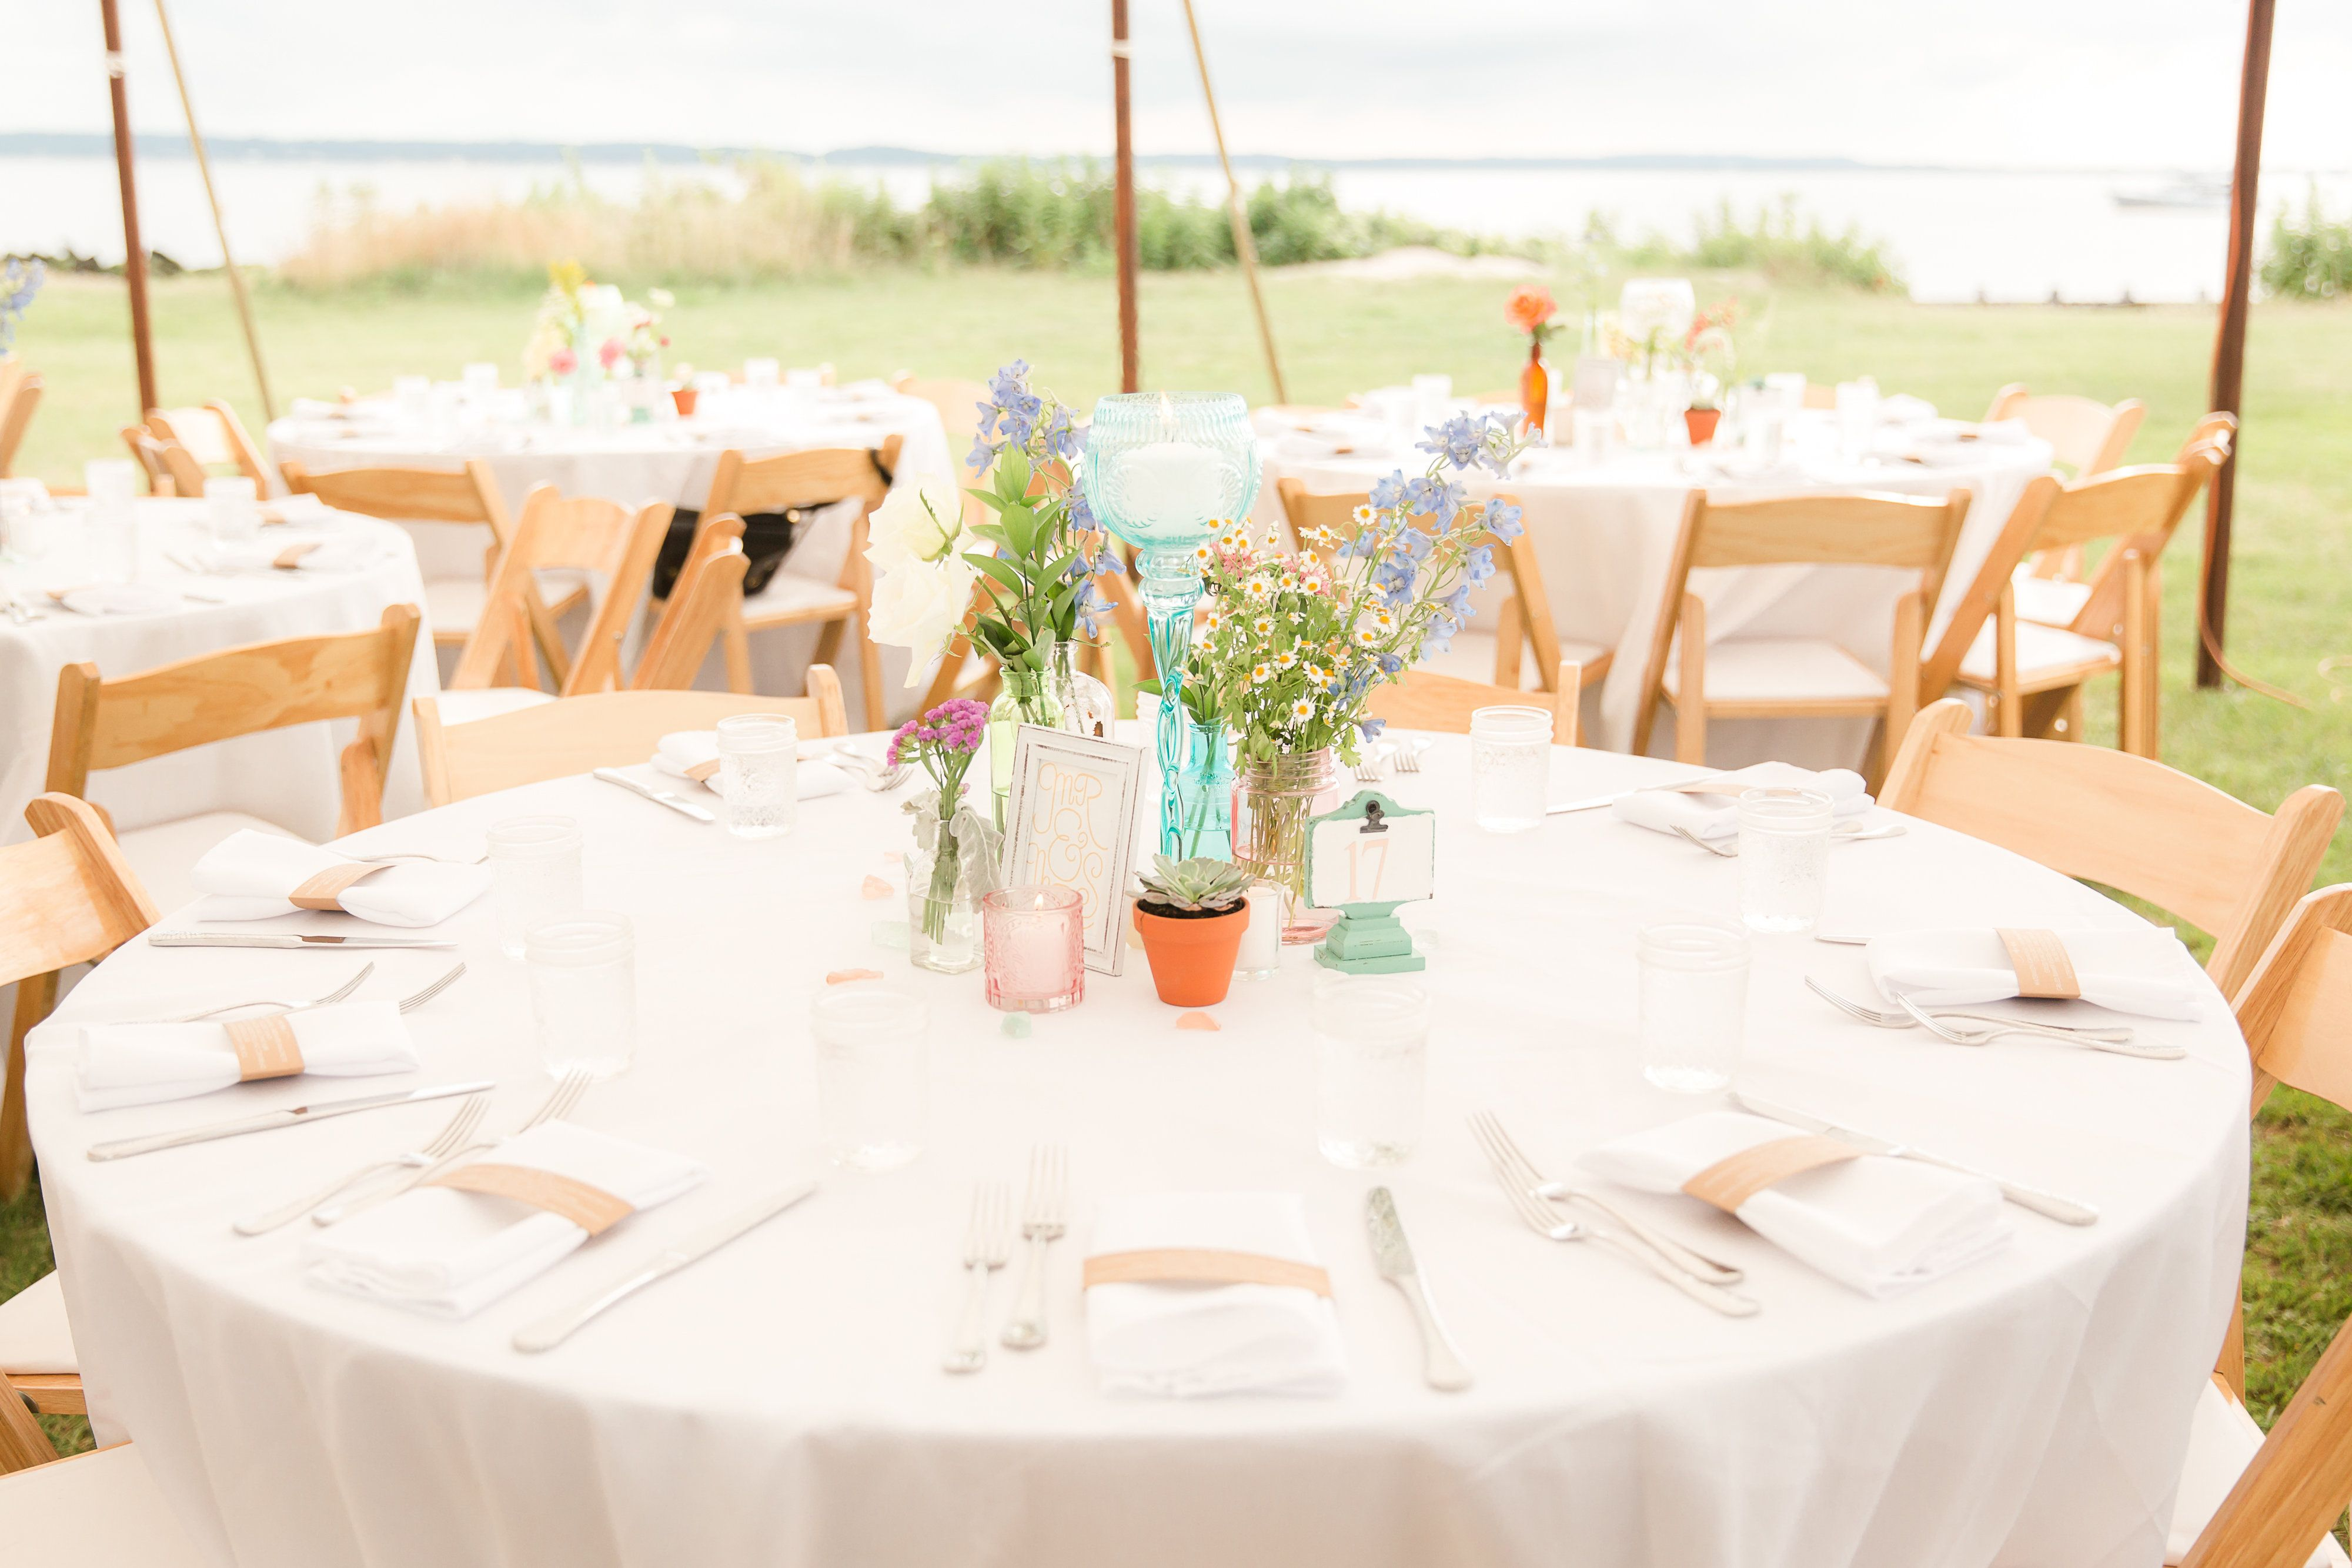 Sandy Hook Chapel Wedding Photos Planning By S To Please Fls Flowers Melinda Photo Idalia Photography